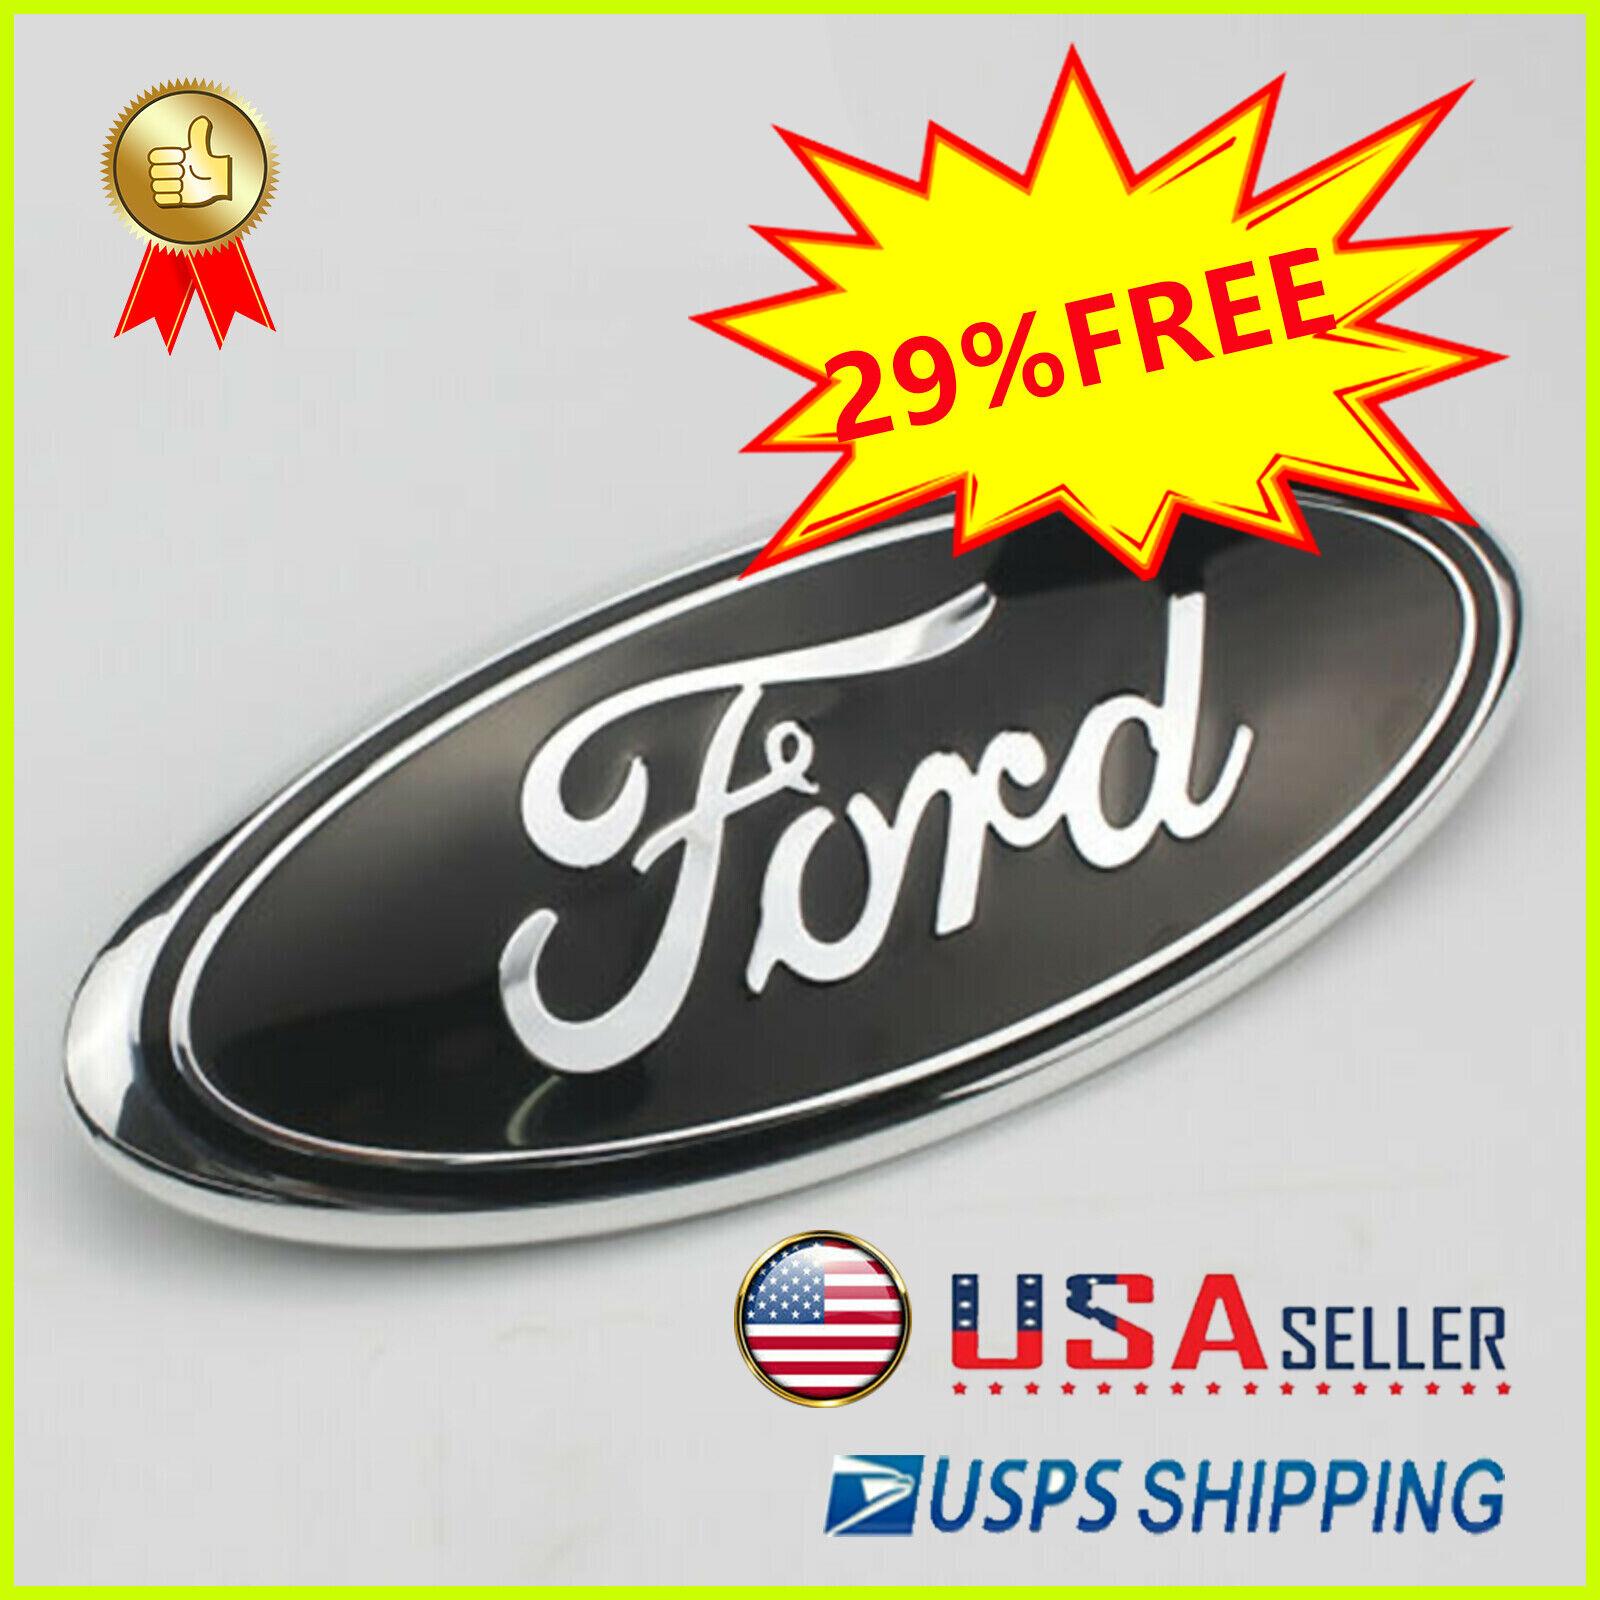 1Pcs 7/9 inch 2005-2014 Ford F150 F250 F350 Rear GRILLE/ TAILGATE Oval Emblem #5